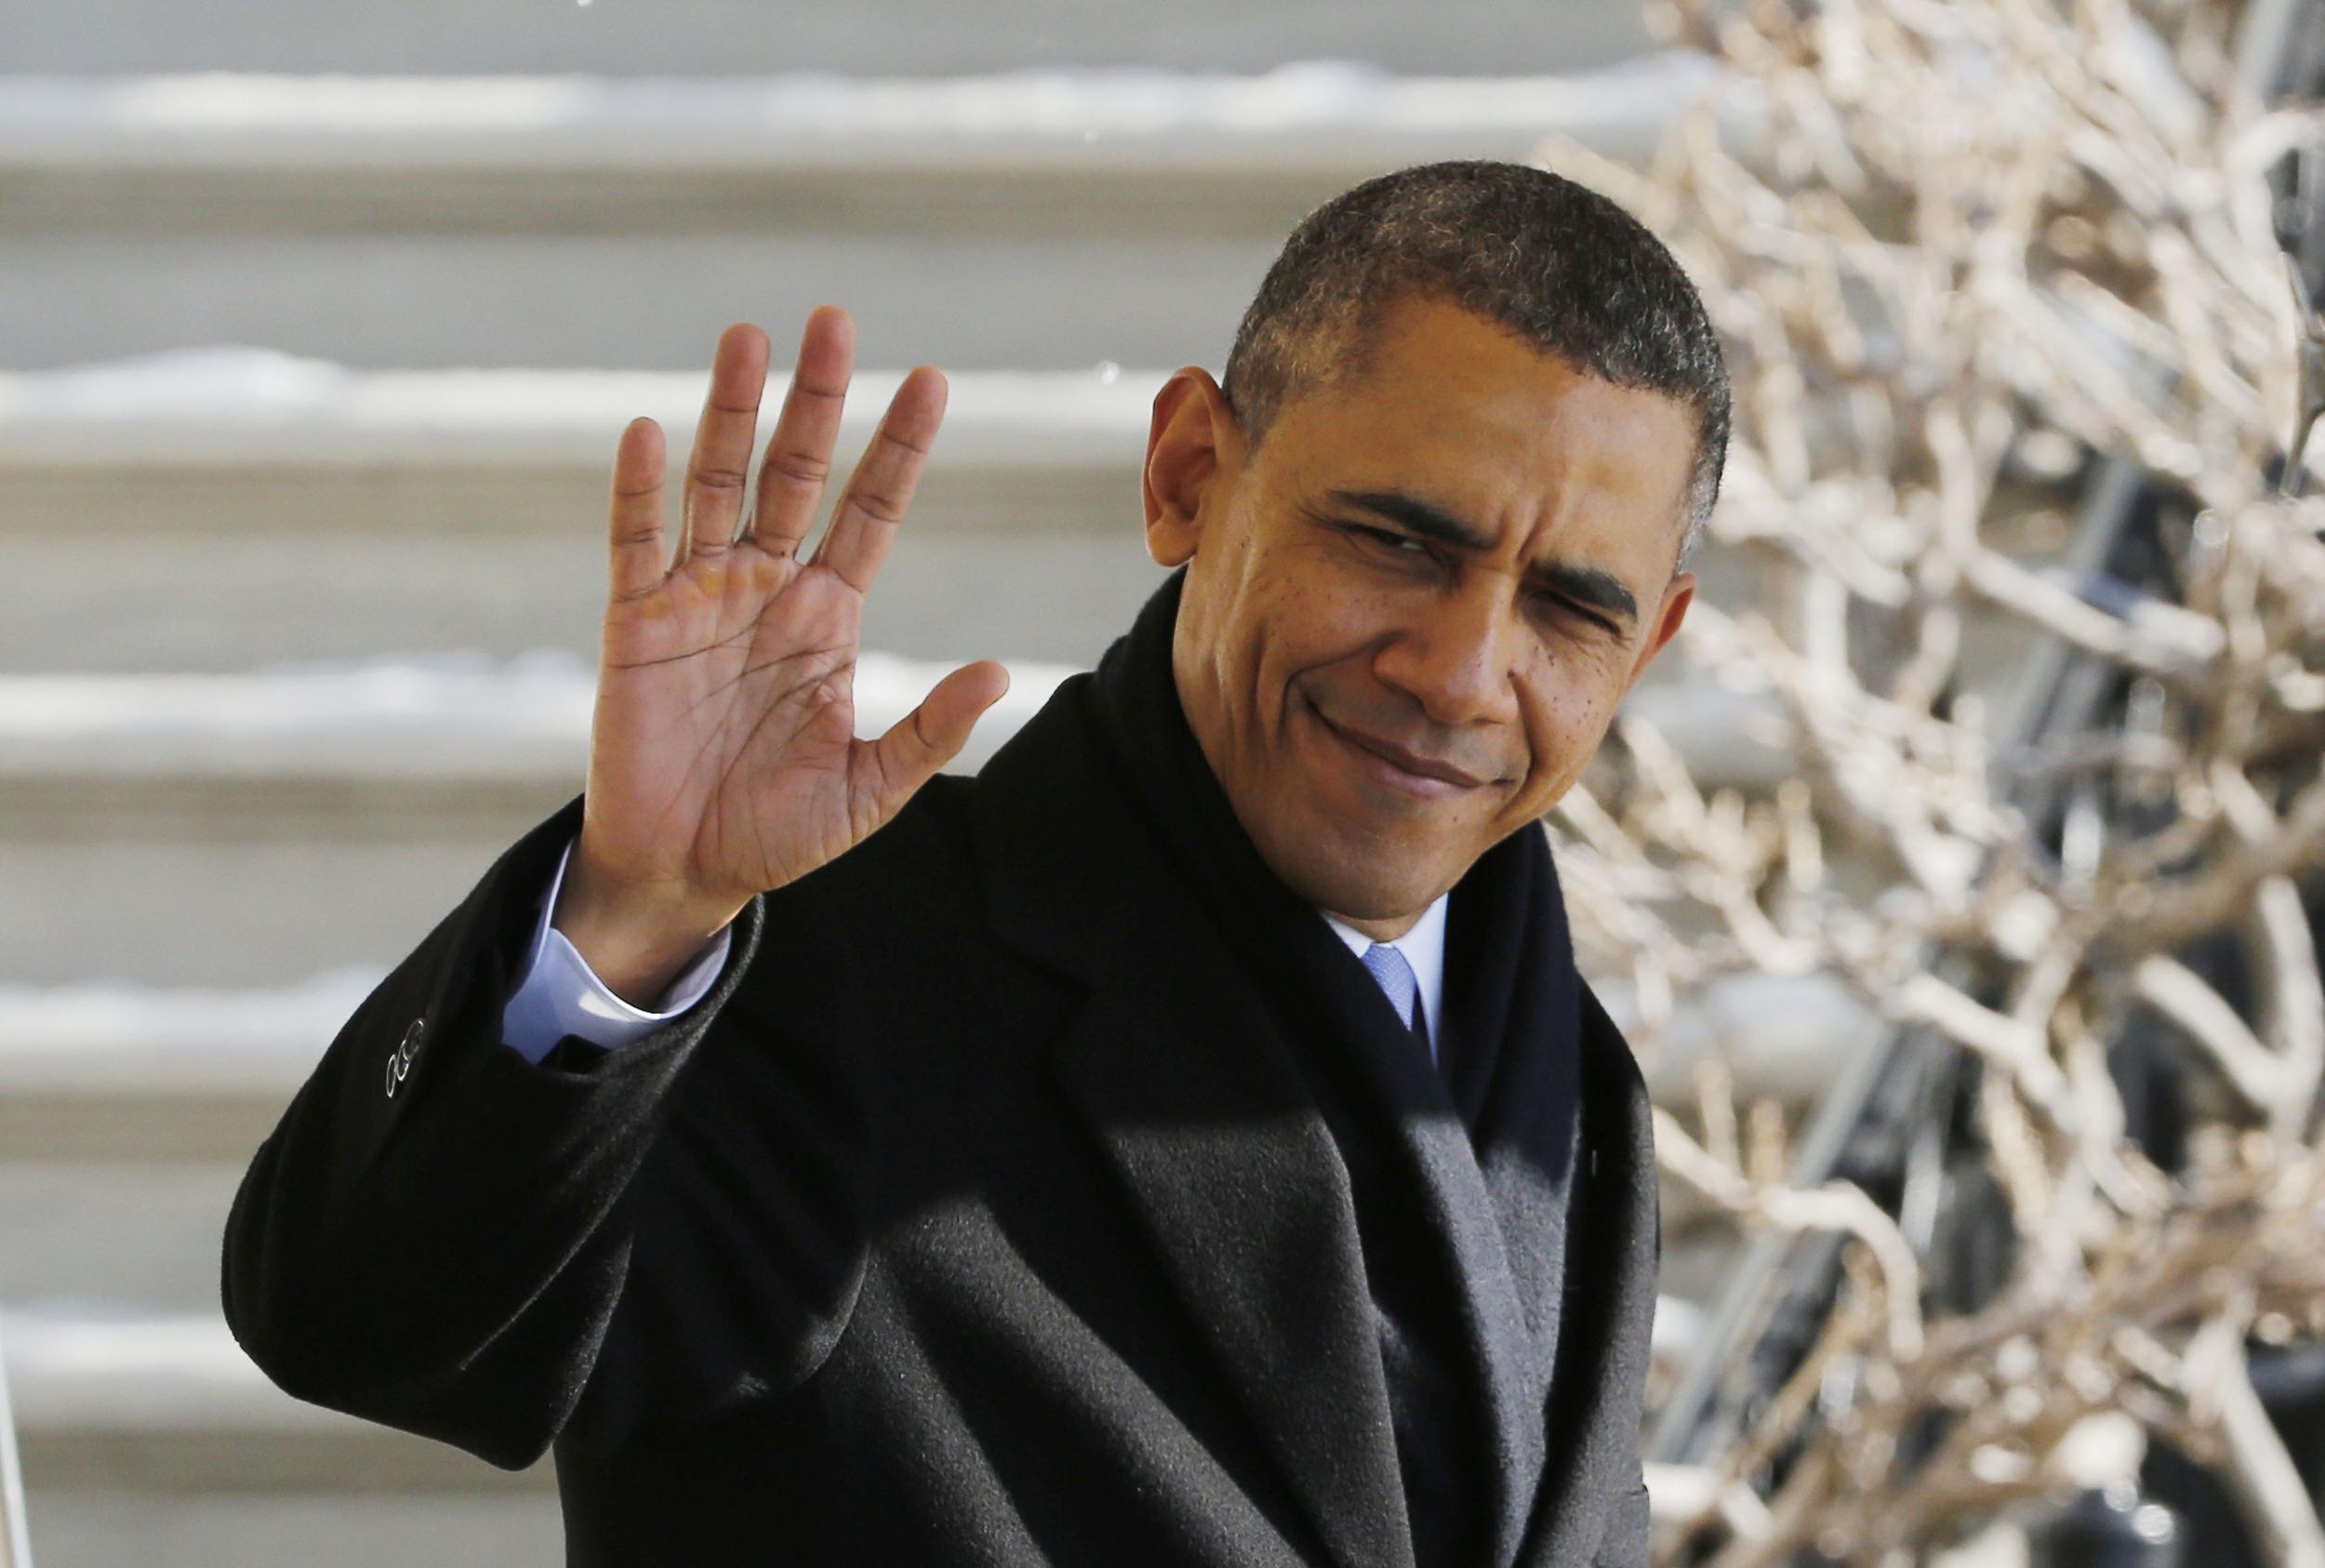 Image: U.S. President Barack Obama waves before departing the White House in Washington